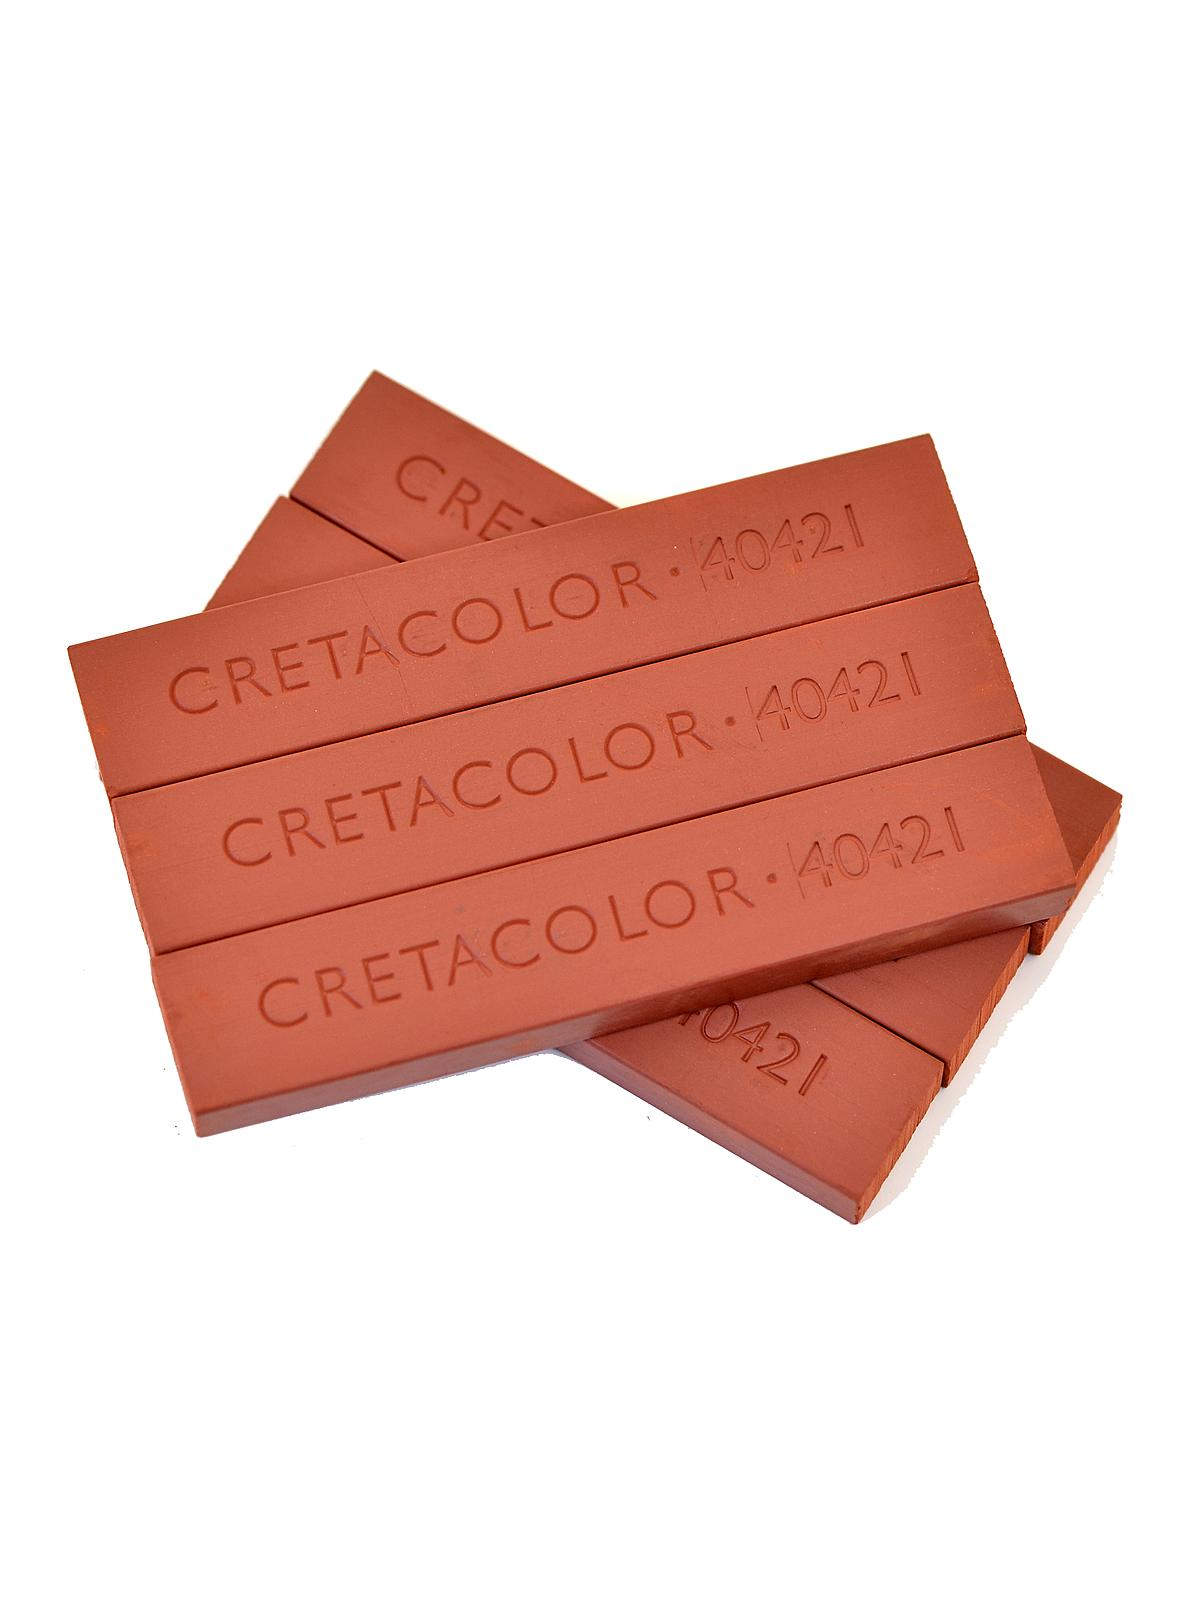 Cretacolor - Dry Stick